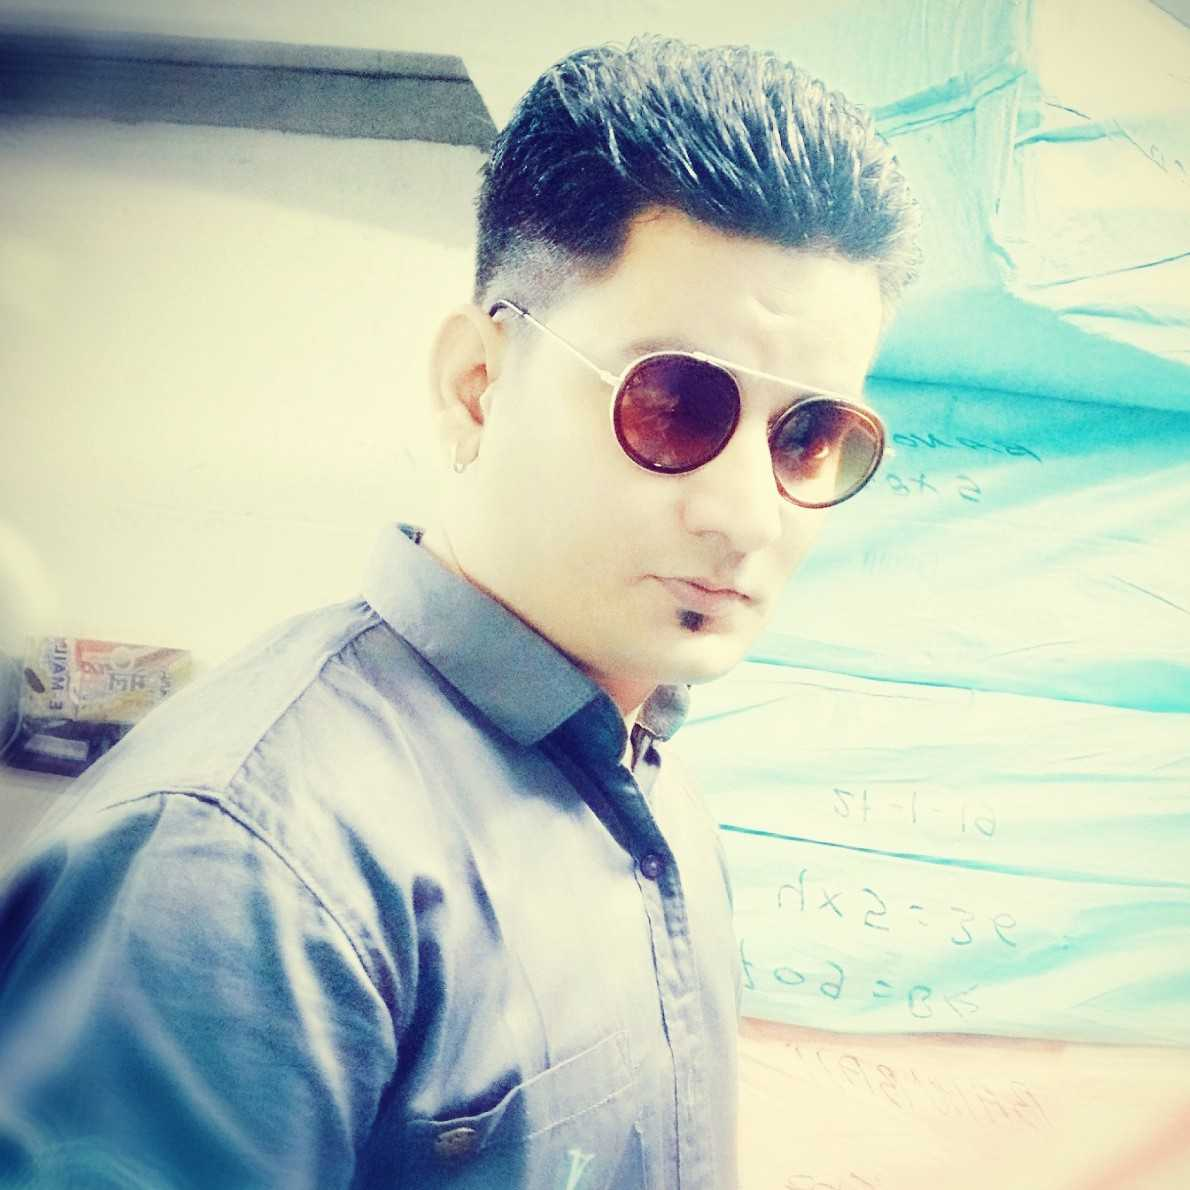 sunny kr talreja follow me tiktok-@sunnykrtalreja